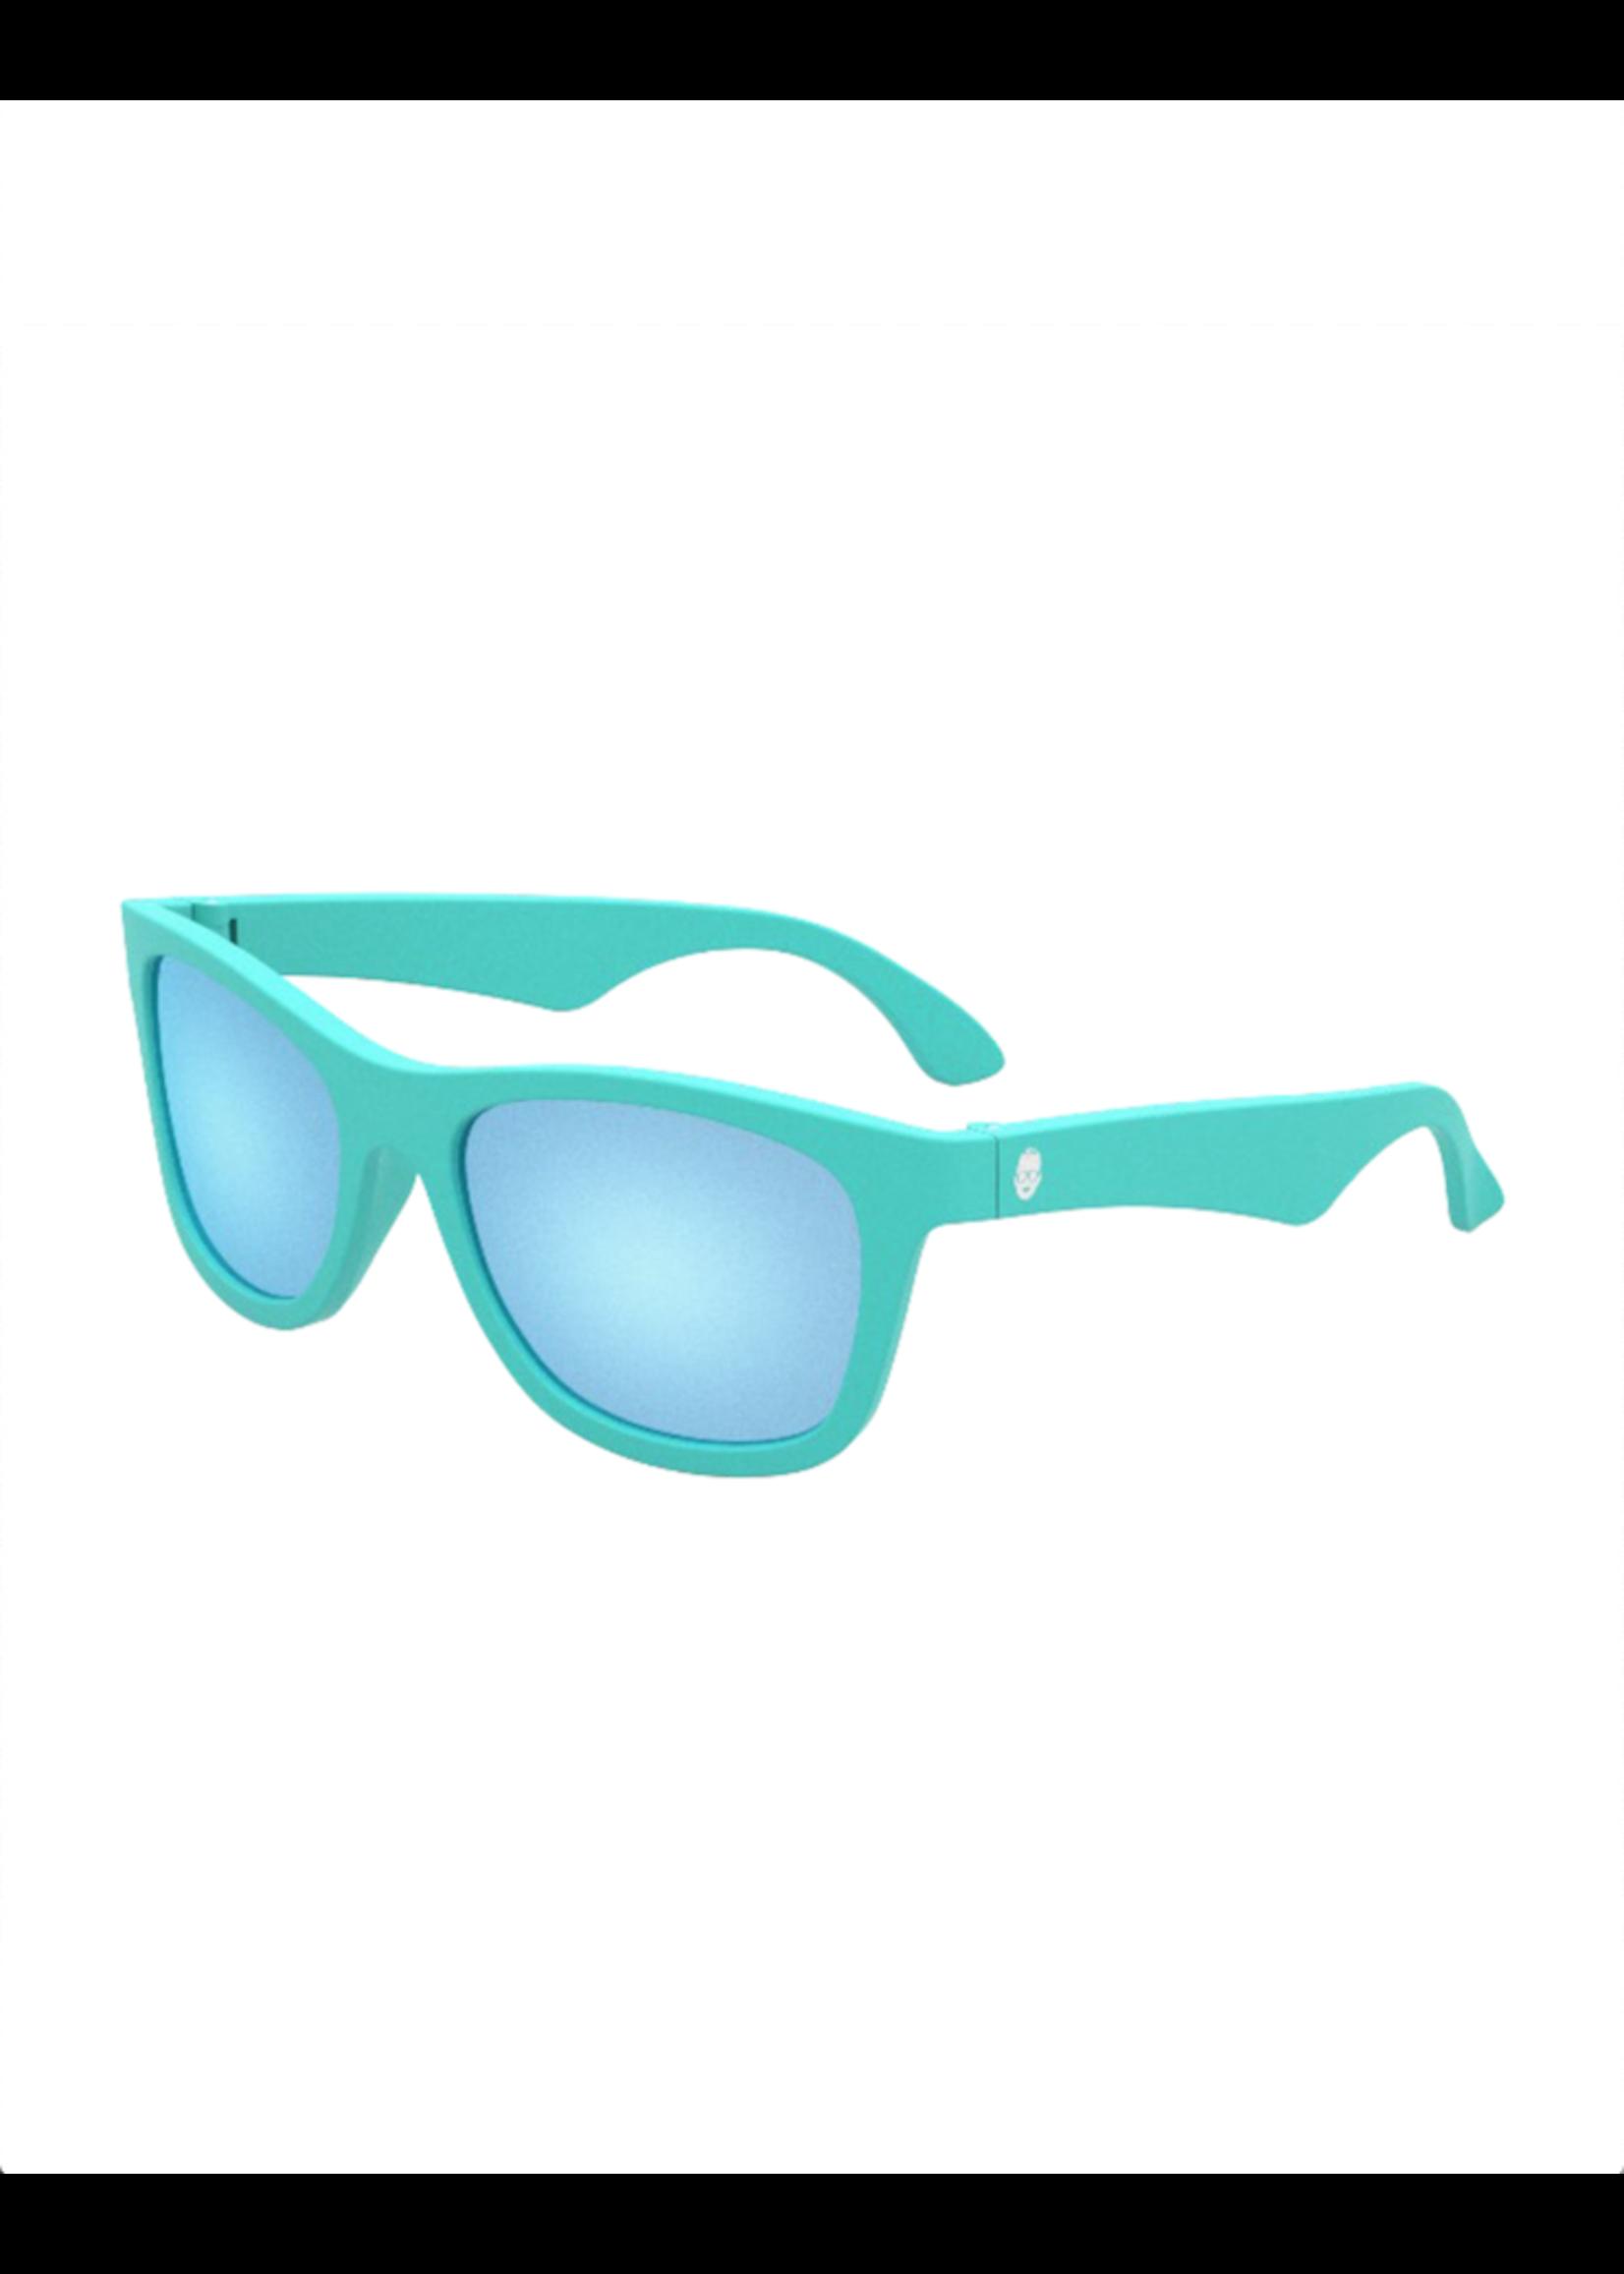 Babiators Babiators, The Surfer, Polarized Sunglasses